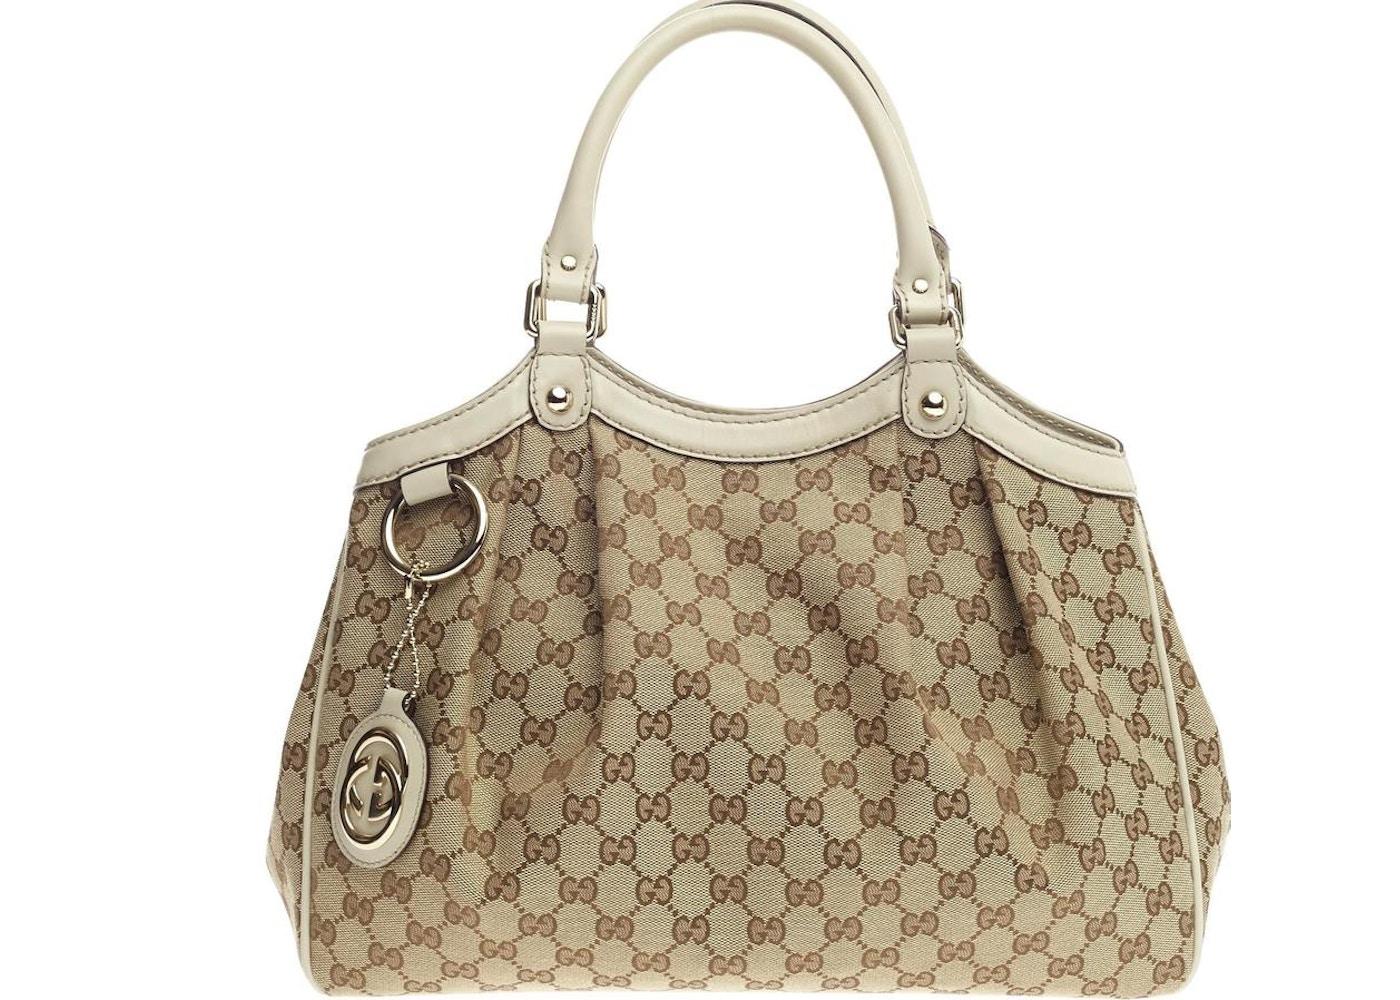 73d3f462aff Gucci Sukey Tote GG Monogram GG Leather Charm Medium Brown ...